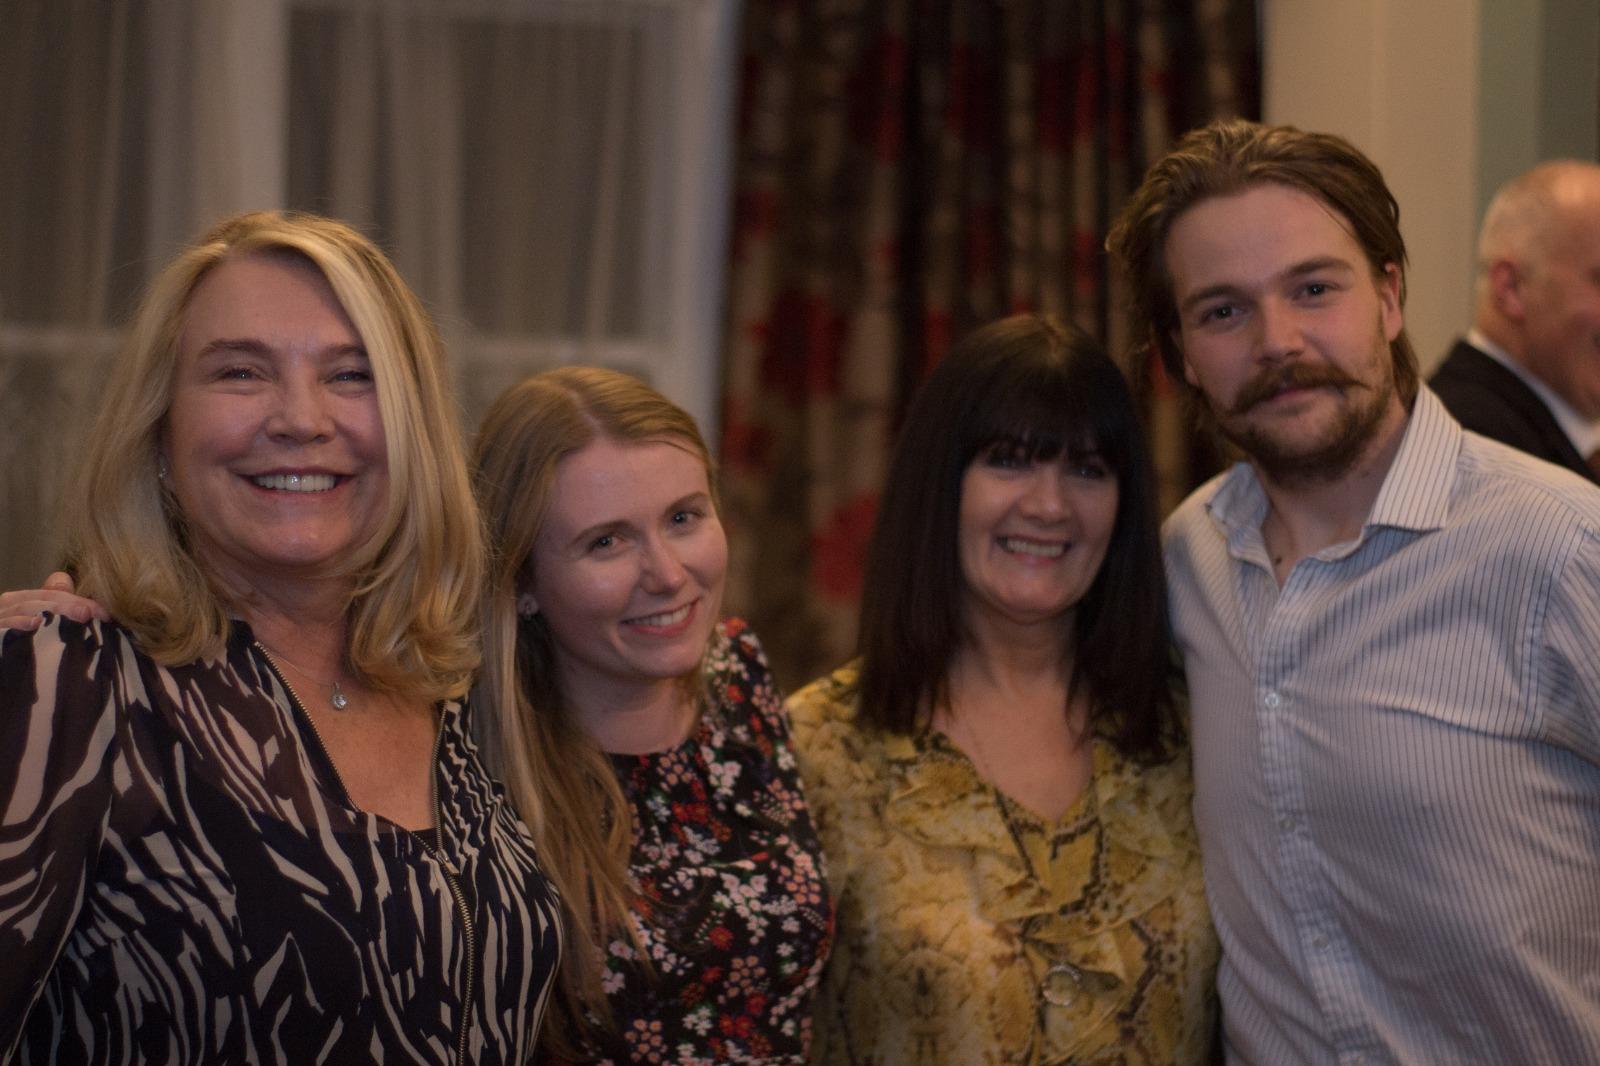 The ATS fundraising team